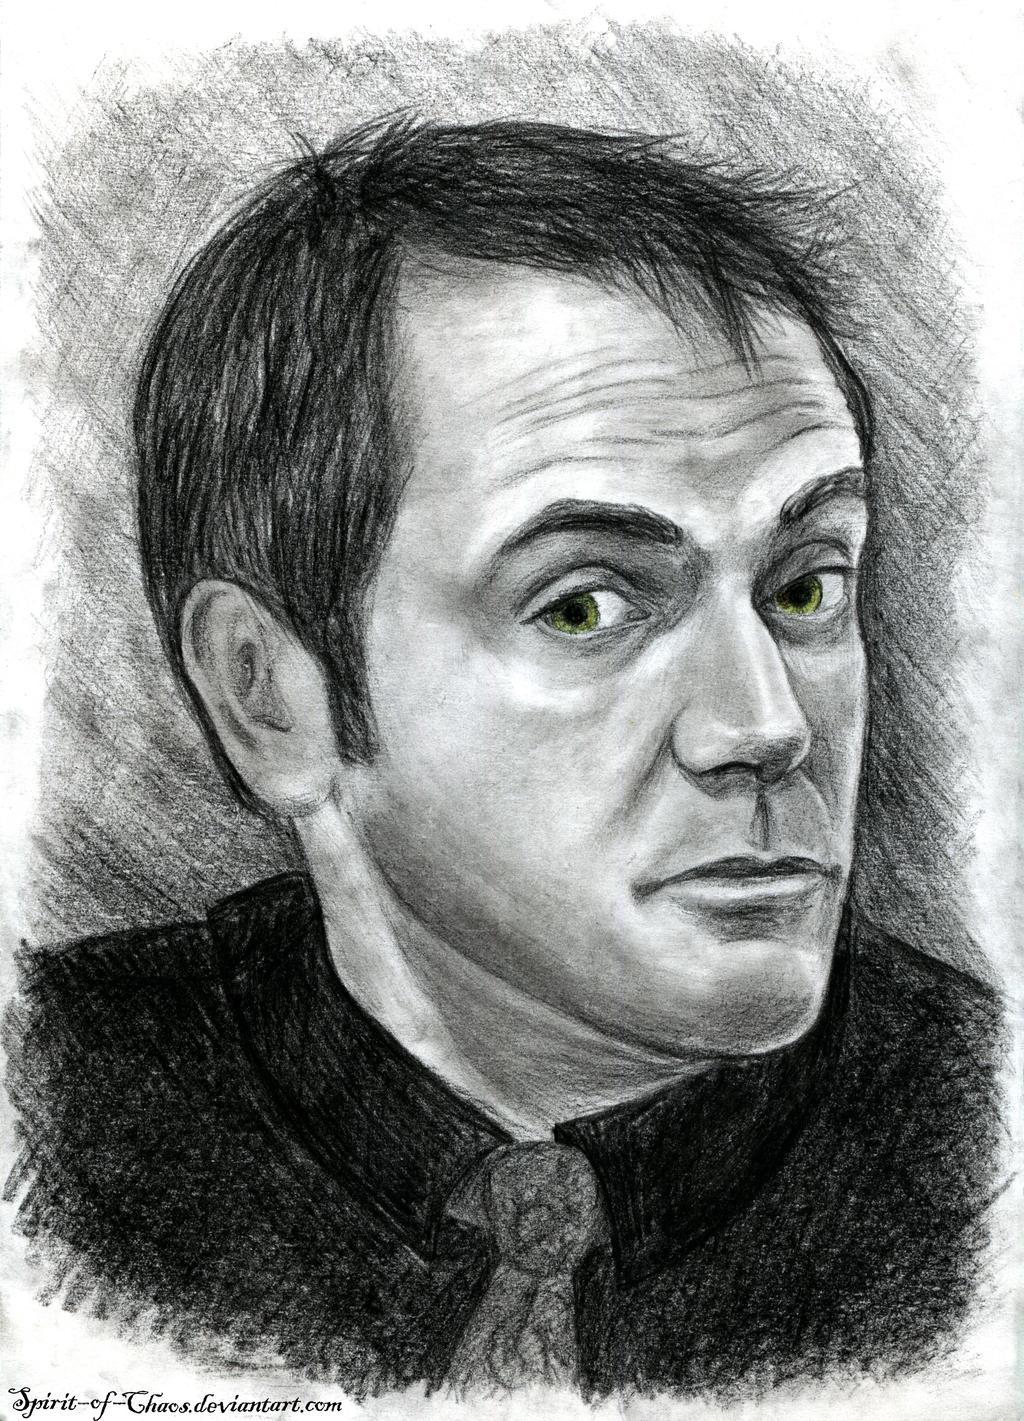 Crowley (charcoal) by SpiritusChaos